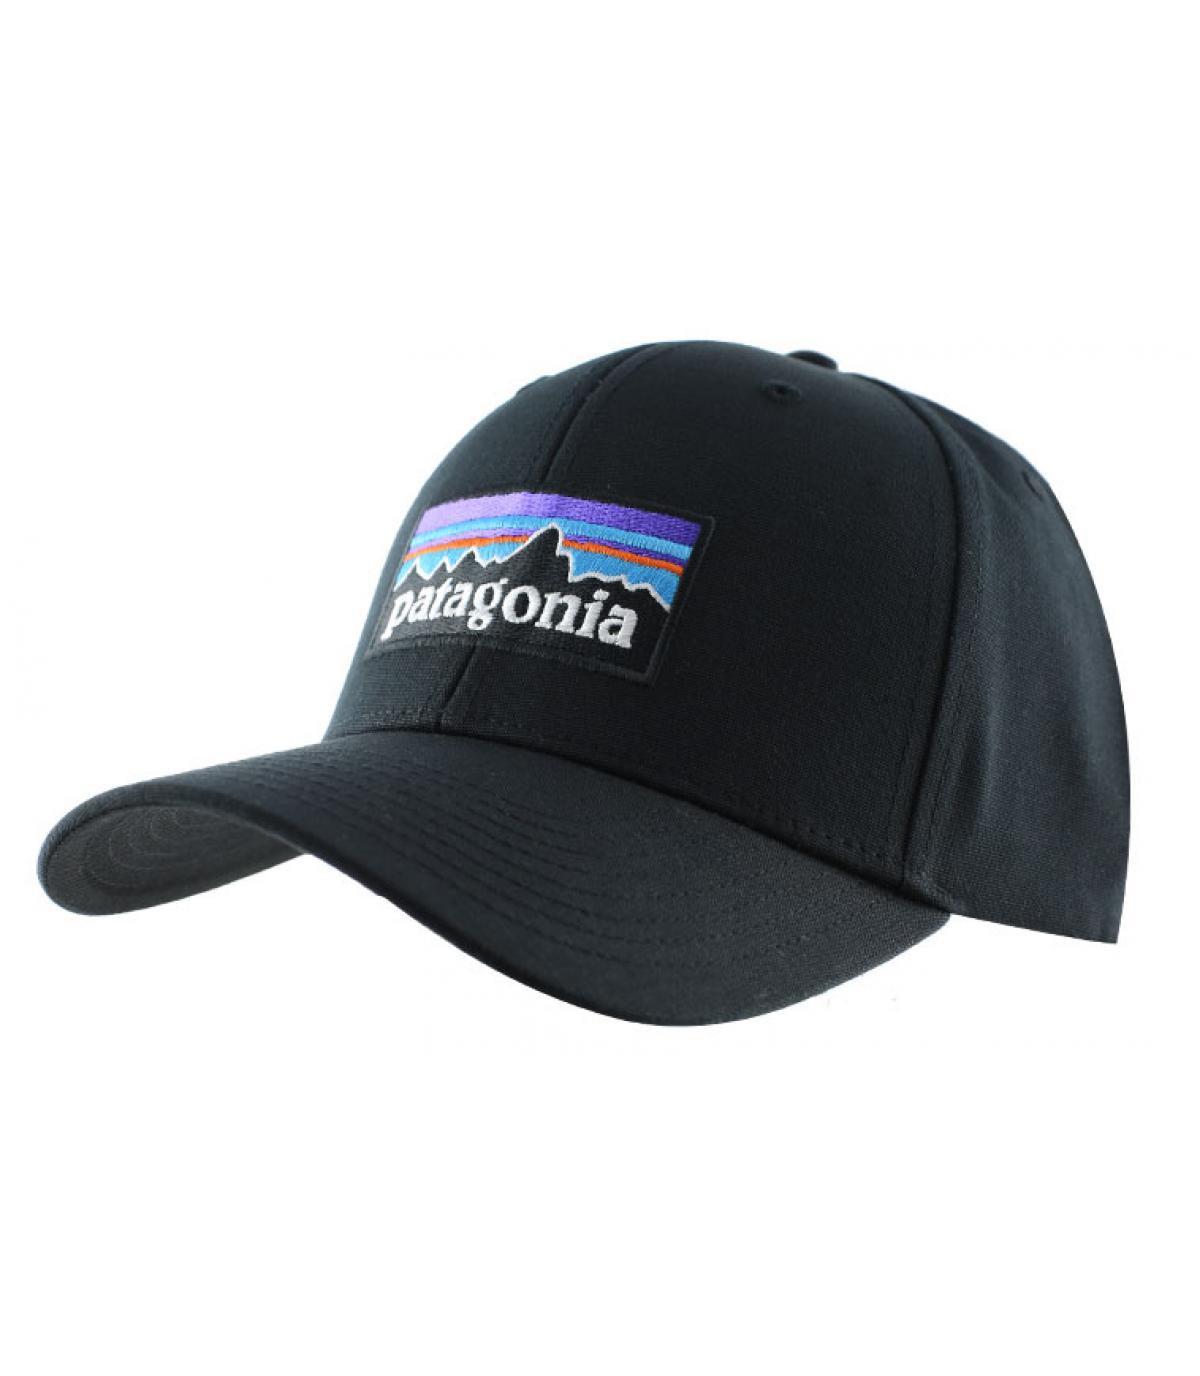 Patagonia black curve cap - P6 Logo Roger black by Patagonia. Headict d831e3579d1